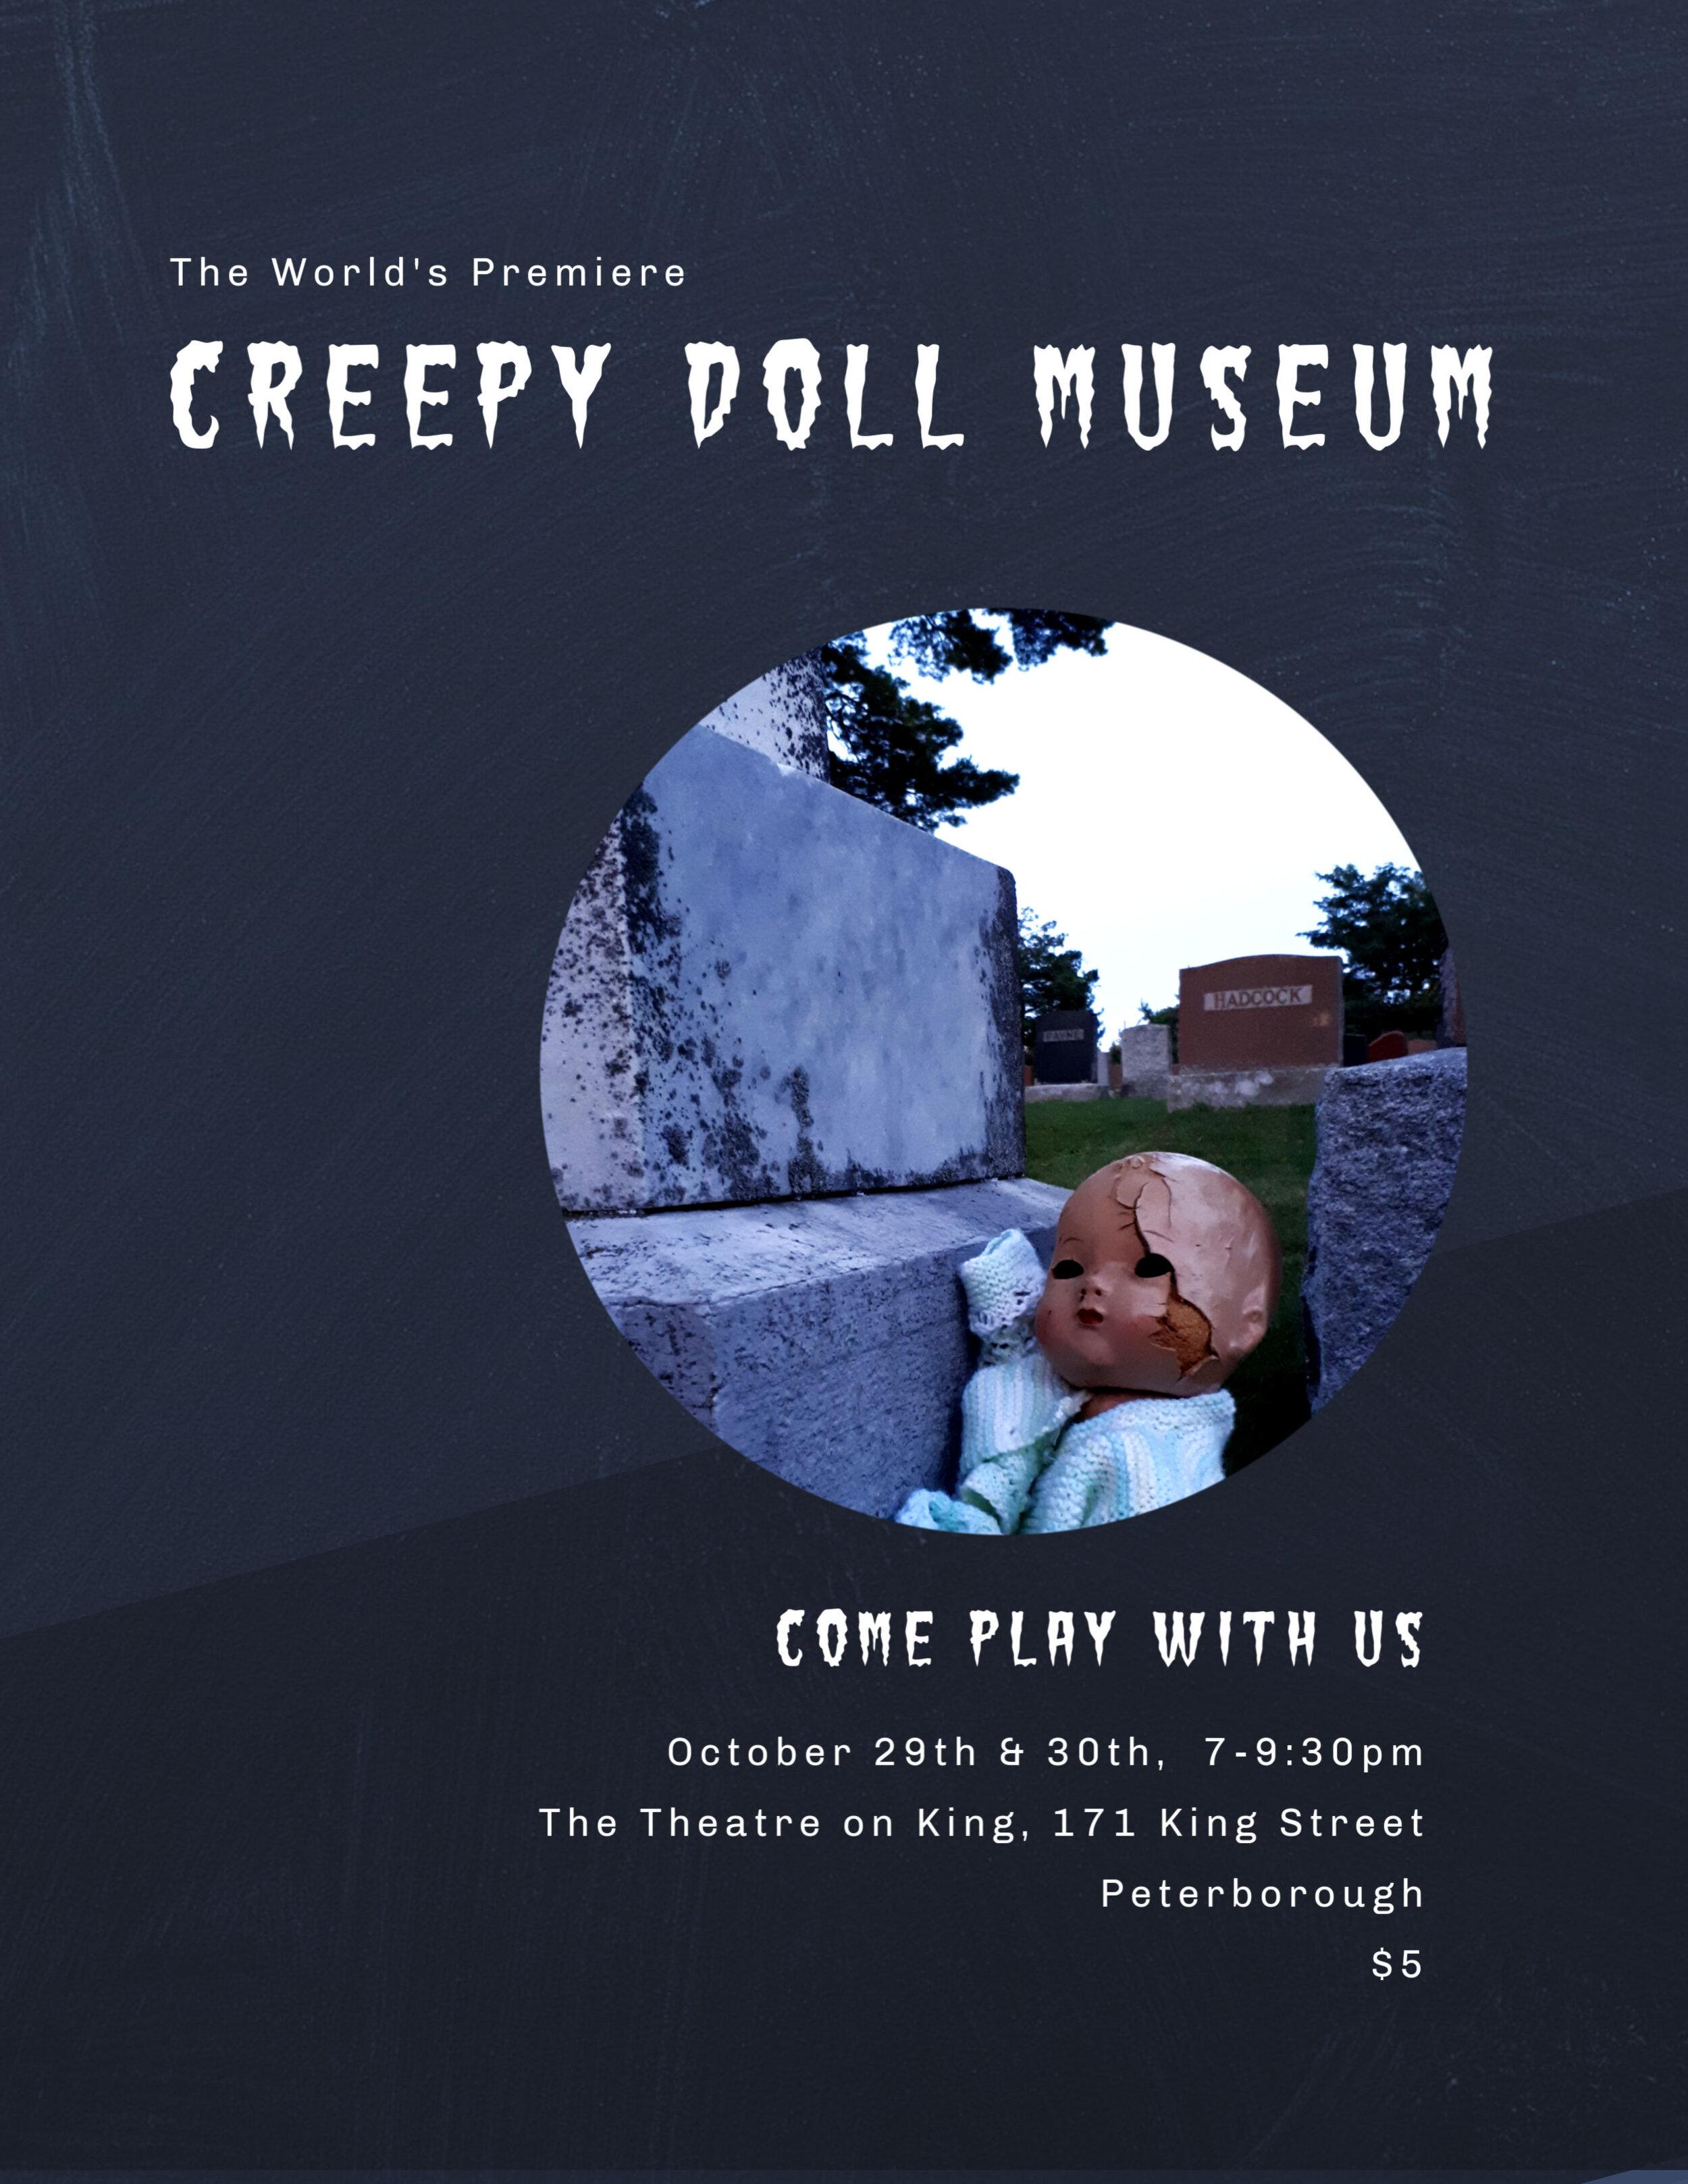 Creepy Doll Museum Post V.2.jpg